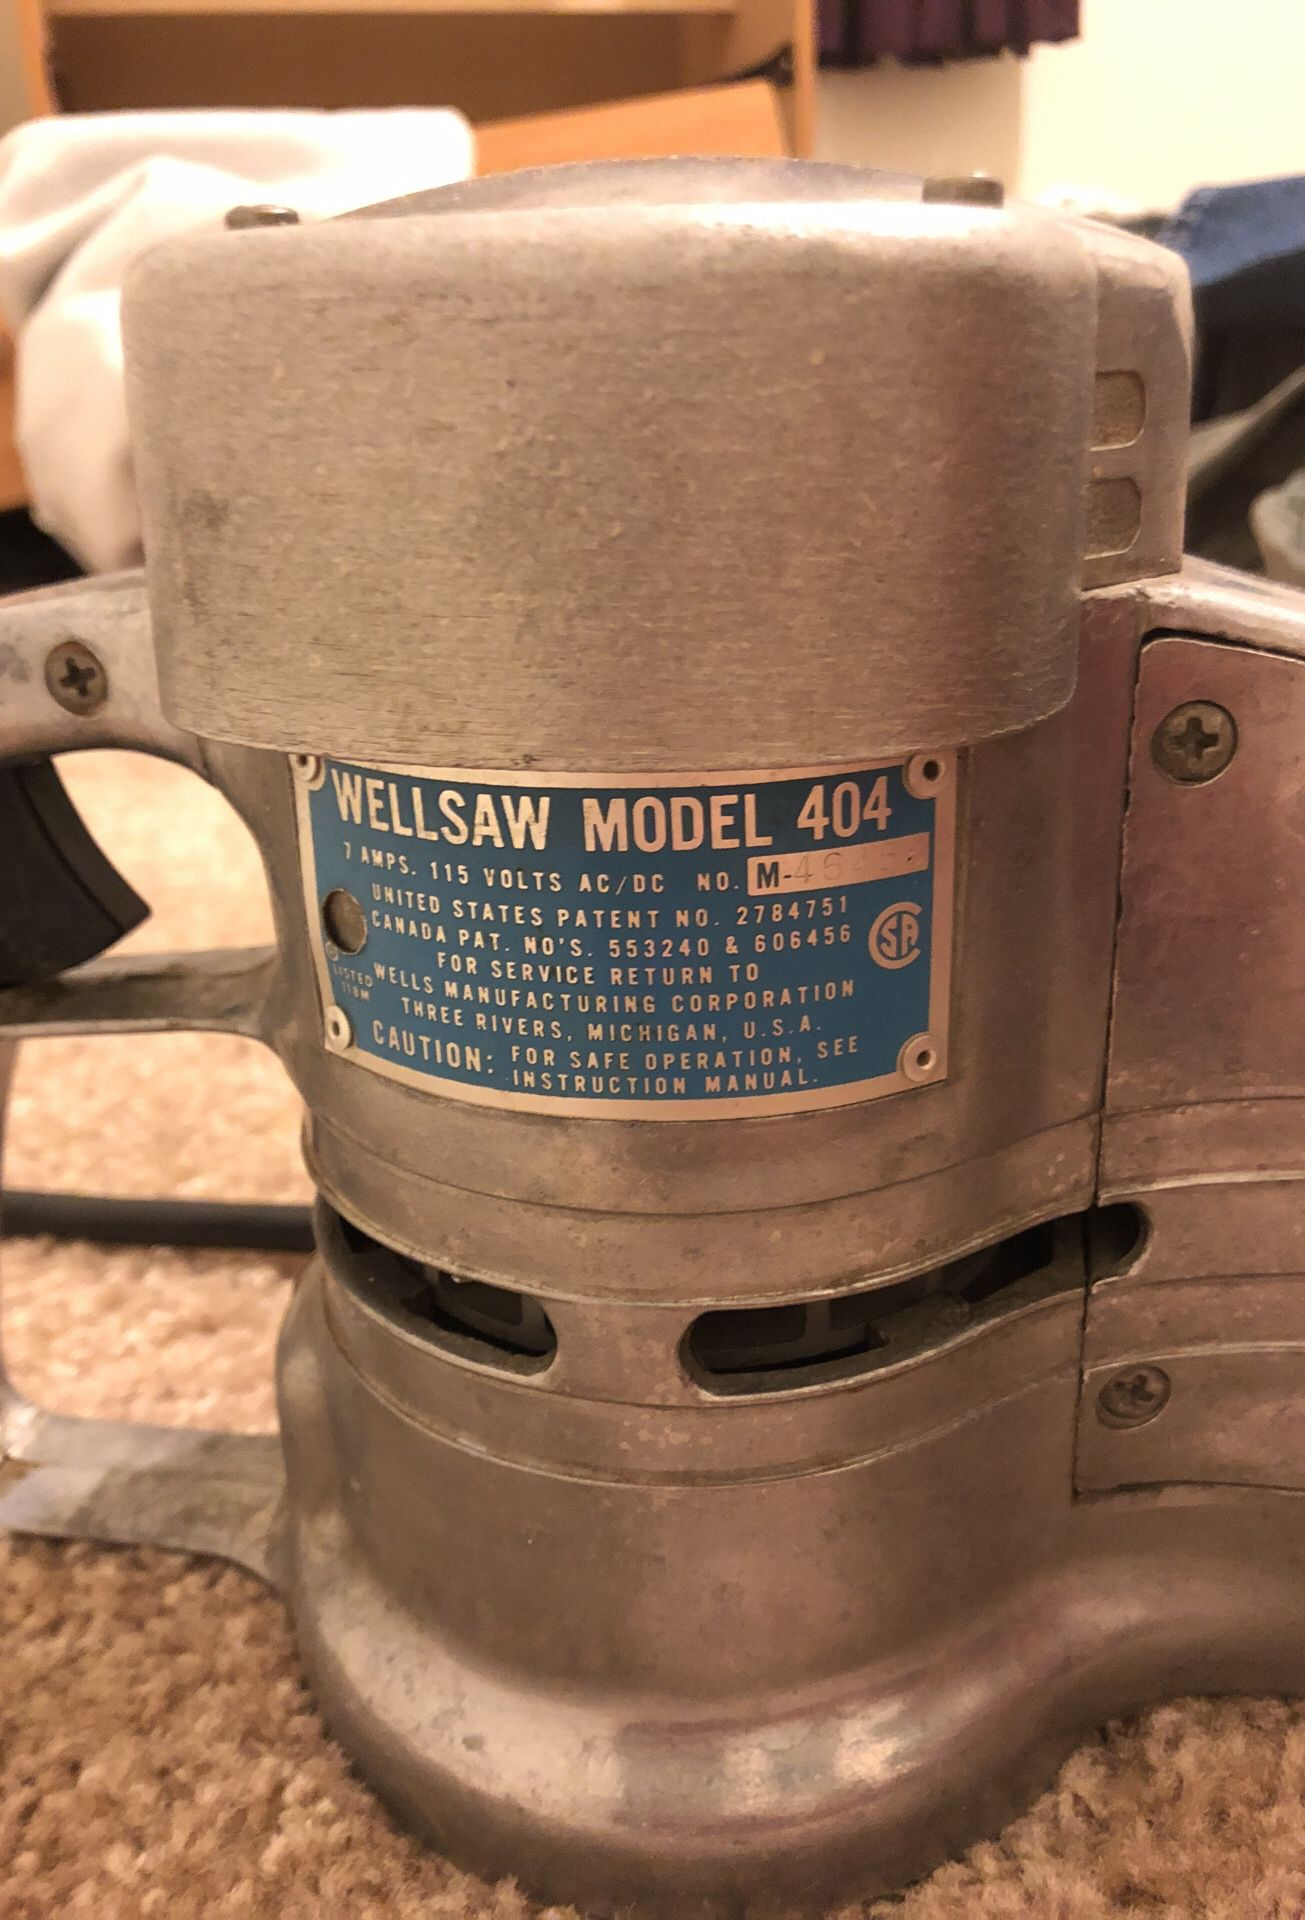 Wellsaw model 404